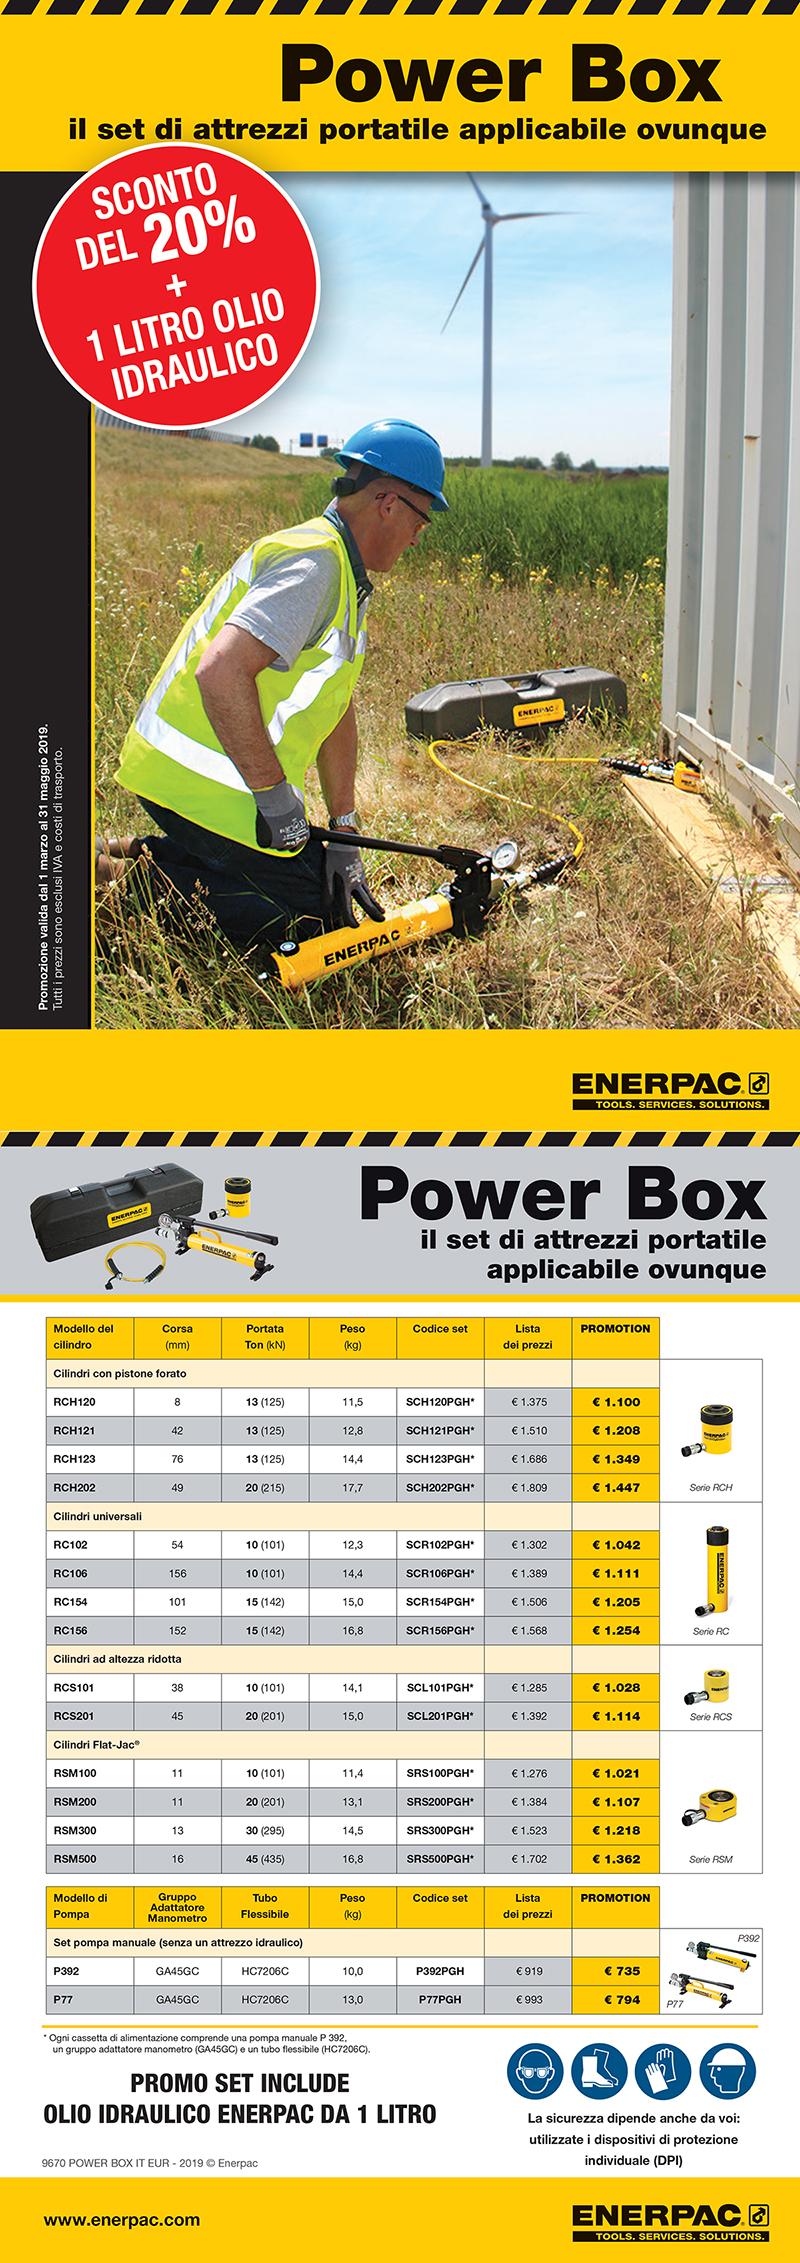 promozione enerpac power box